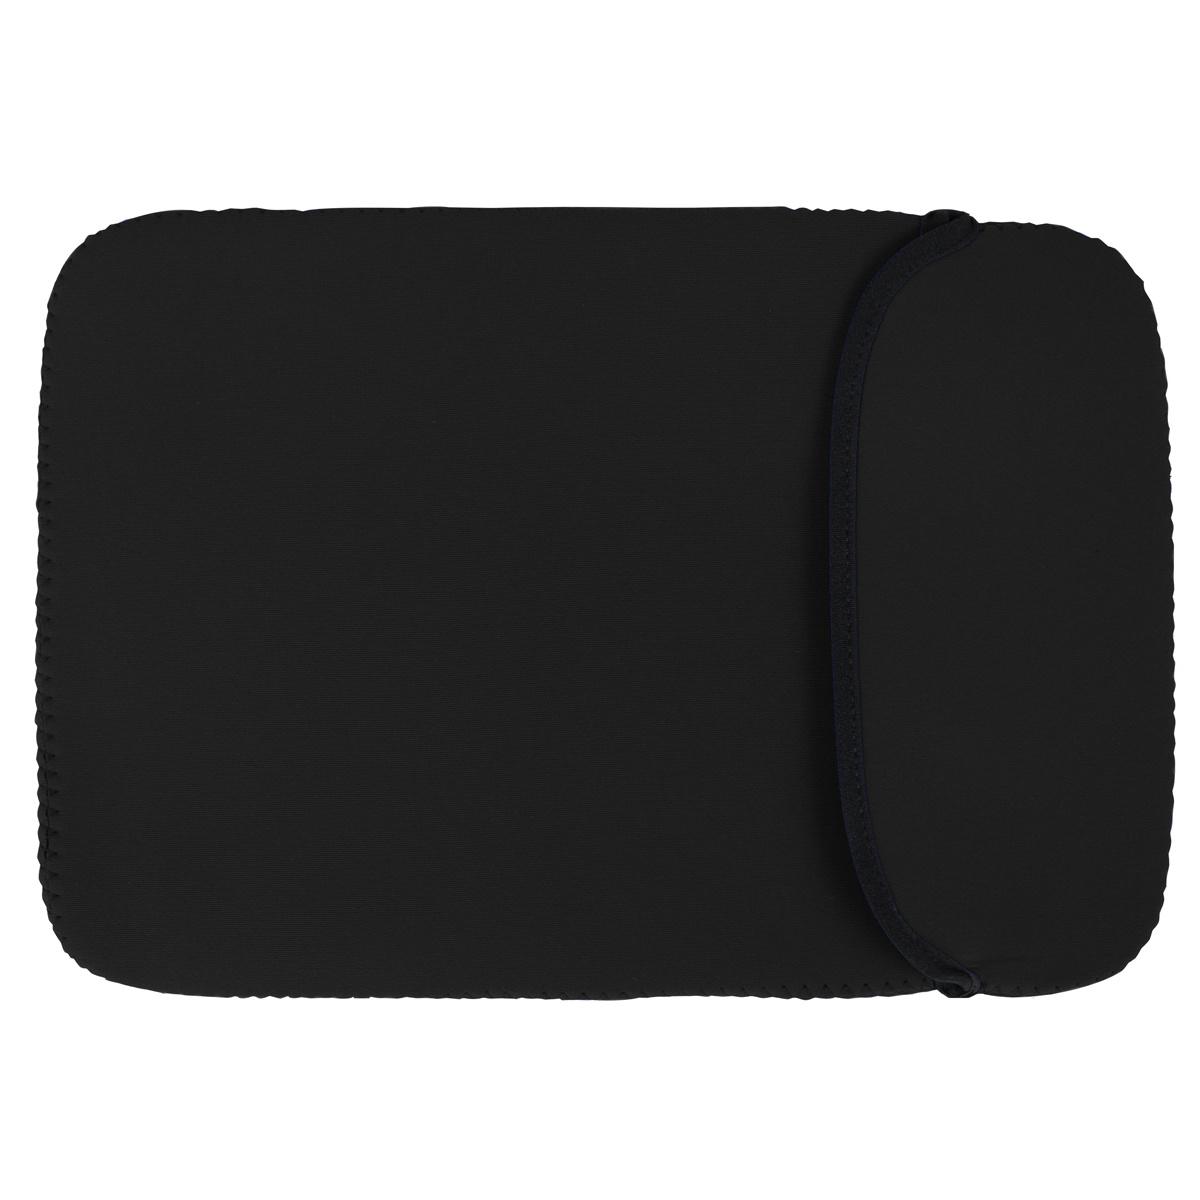 13 Inch Macbook Laptop Chromebook Neopreen sleeve case Zwart